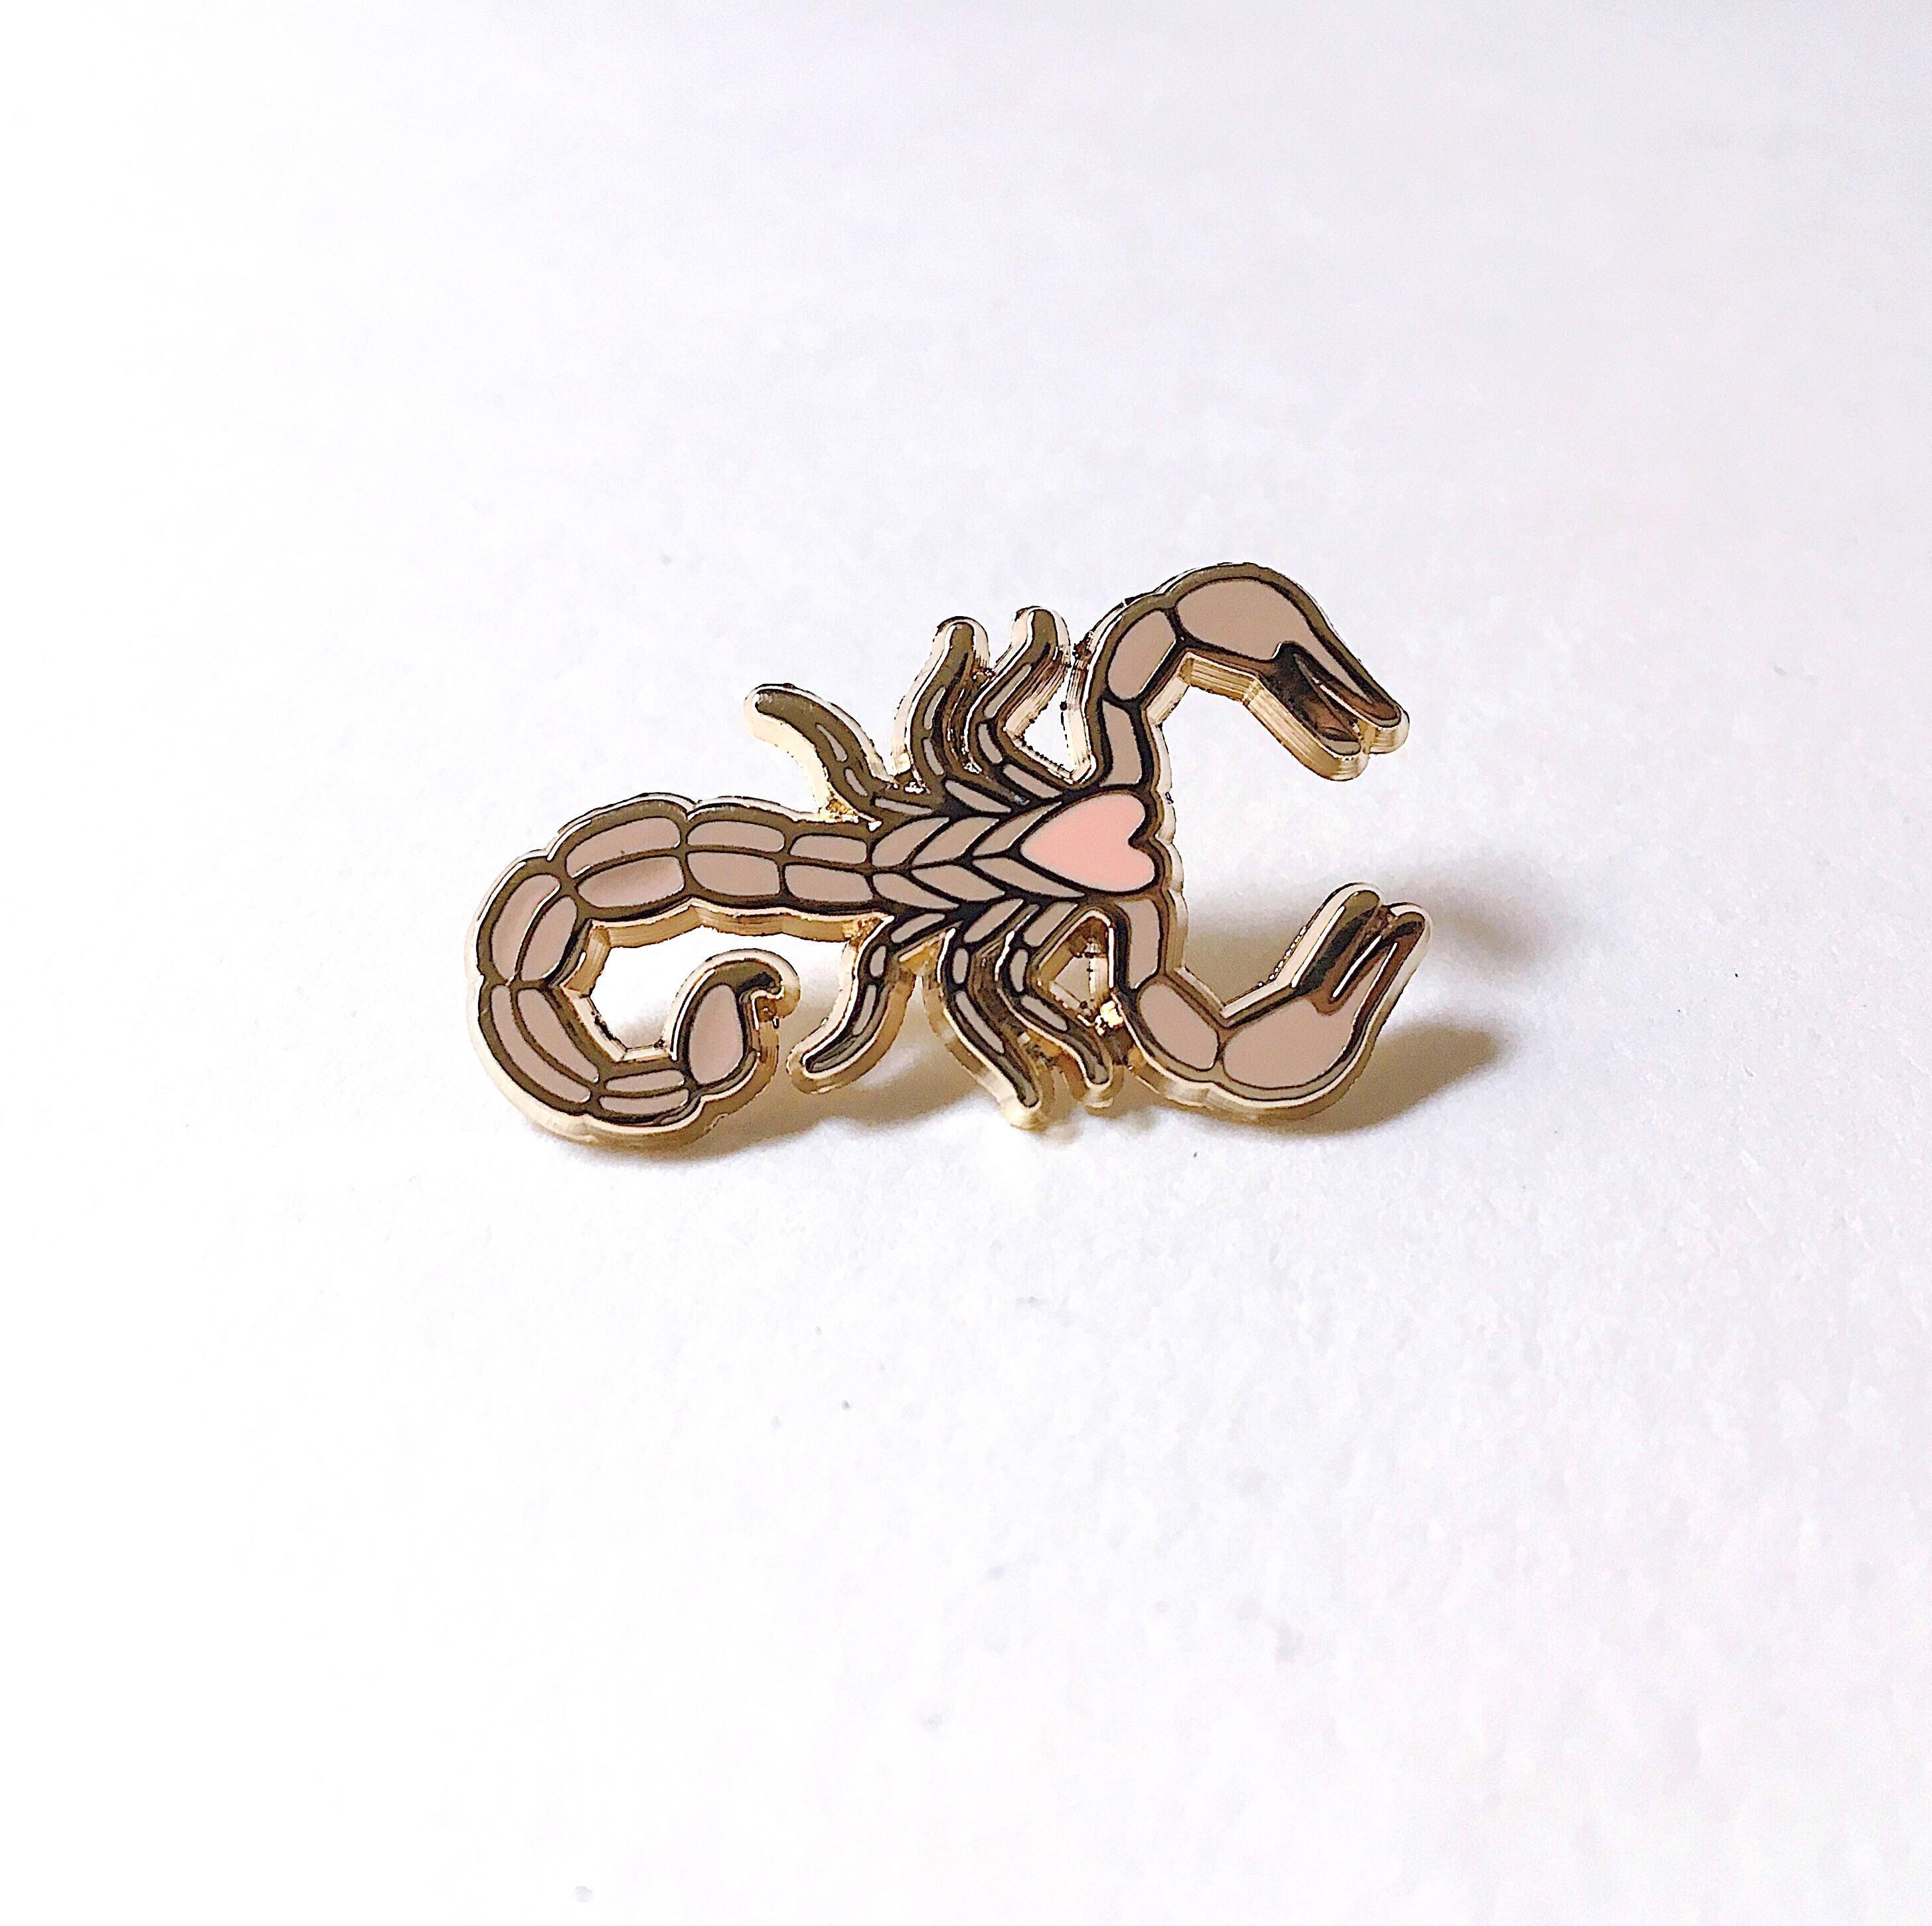 Scorpion Lapel Pin